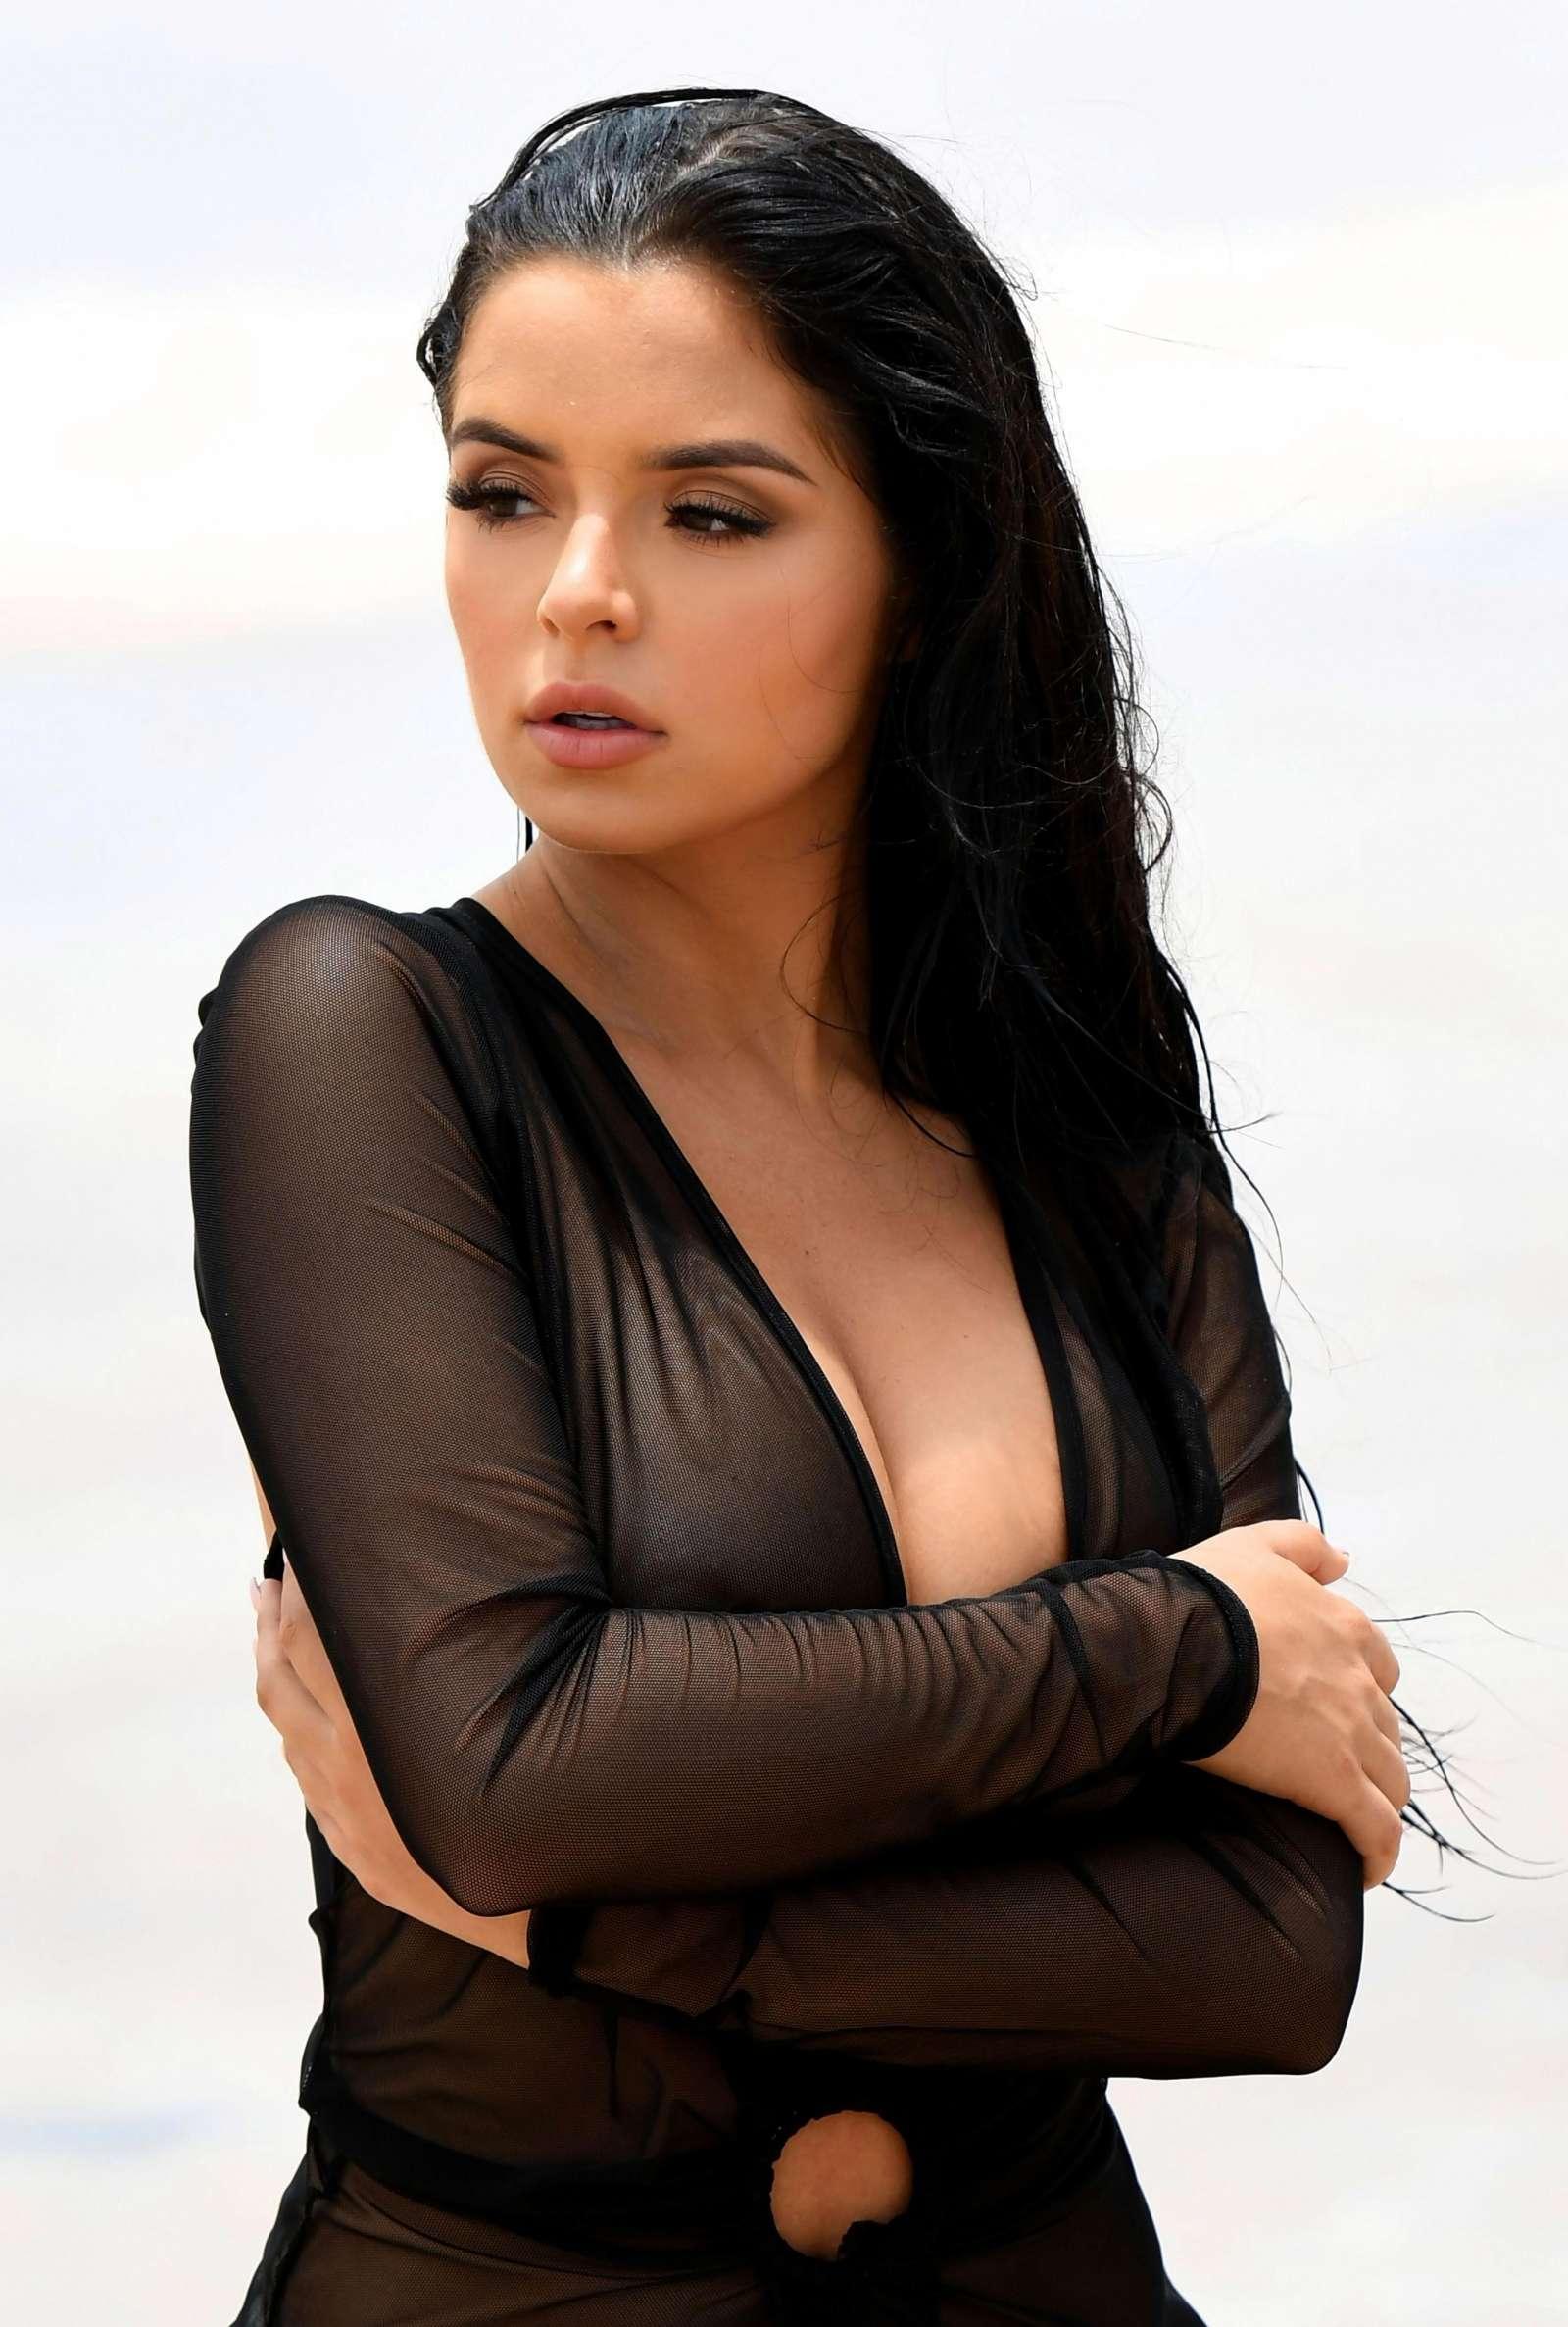 Demi lovato hot ass clips - 3 8